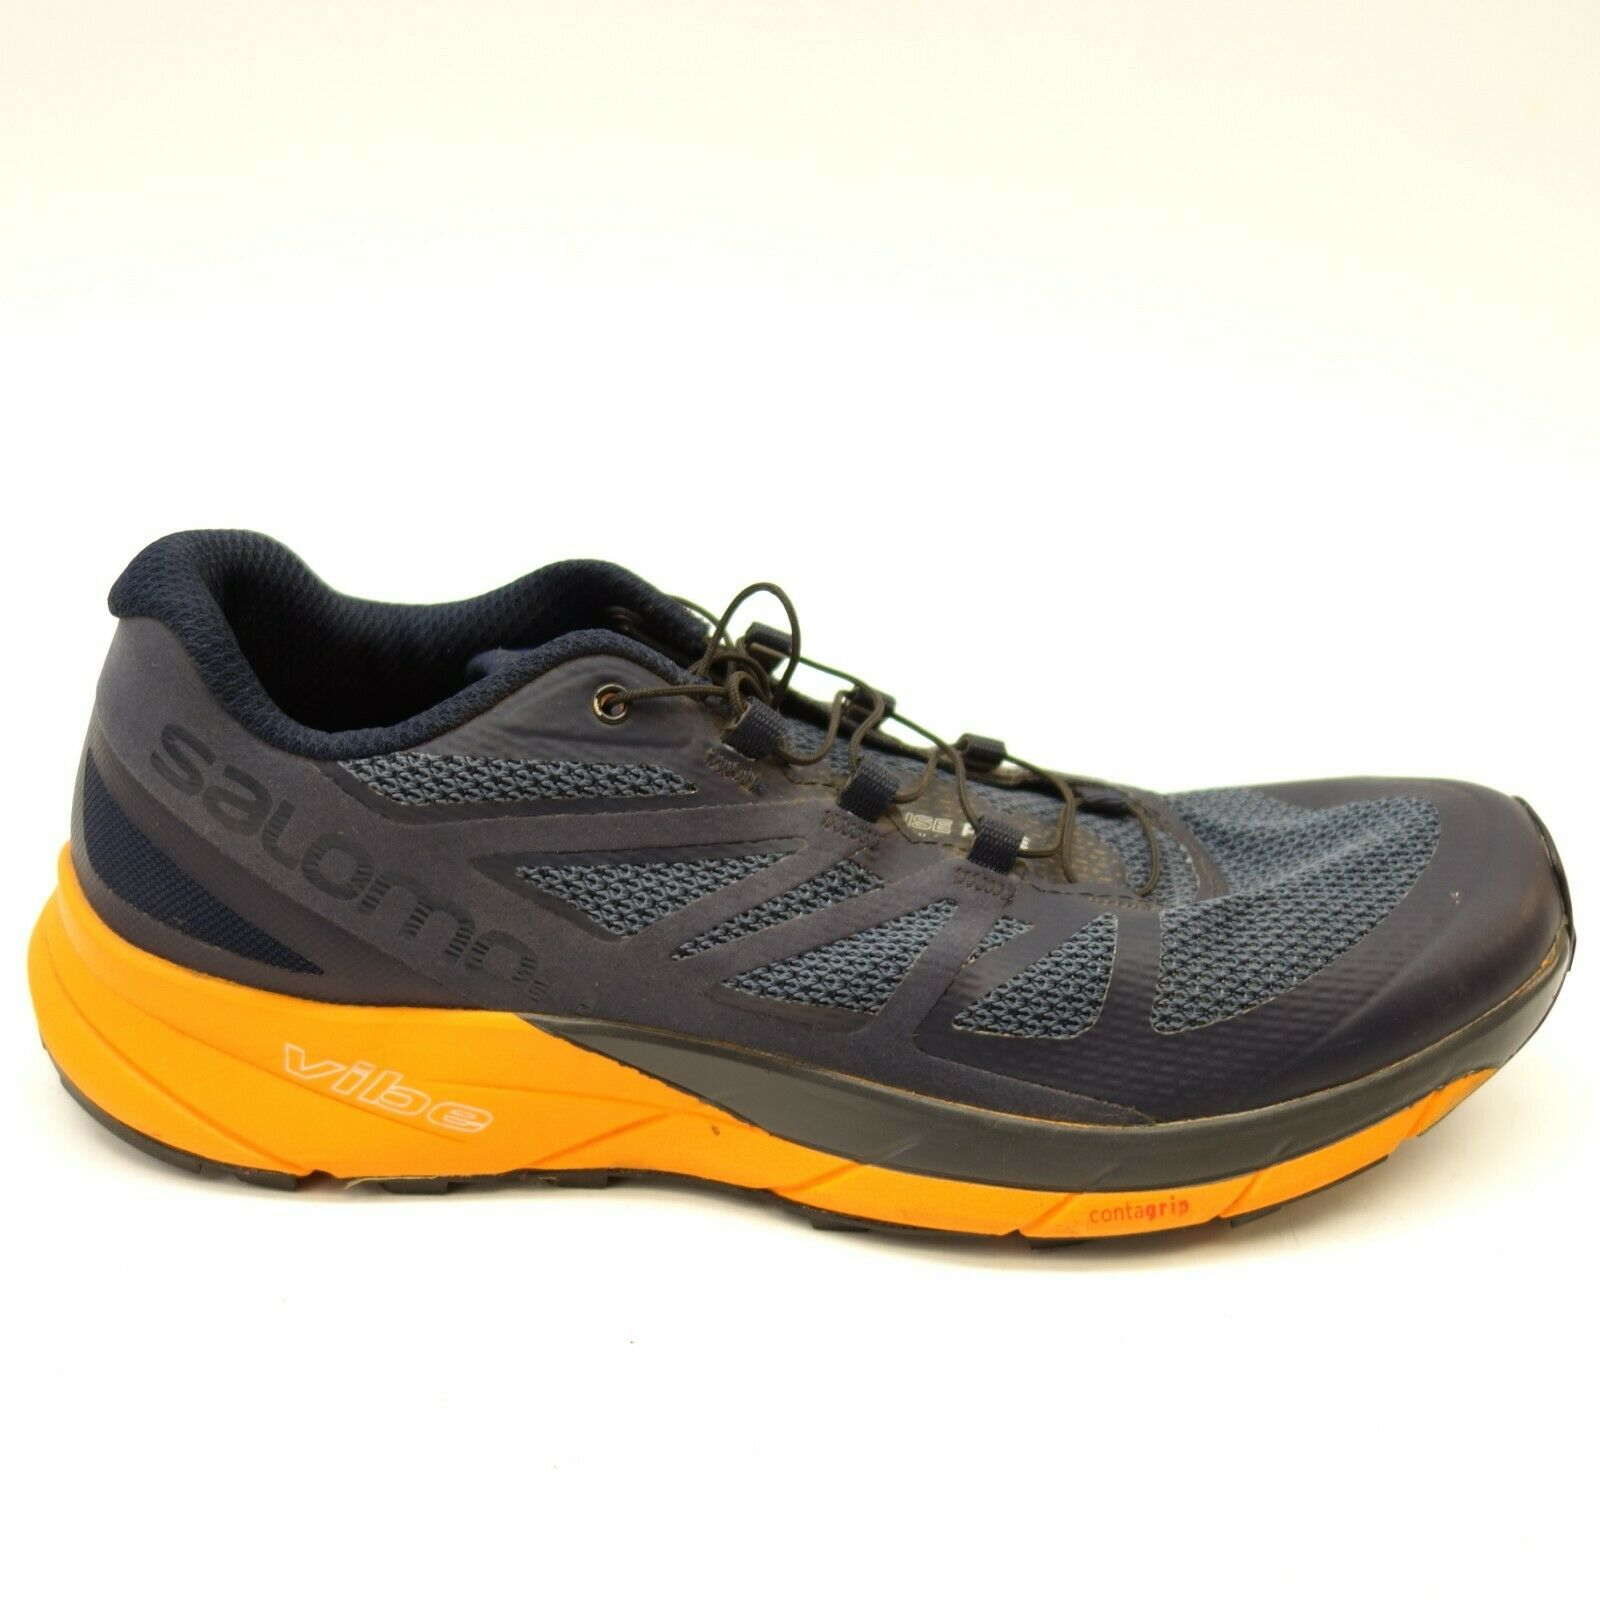 Salomon Mens Sense Ride bluee Athletic Hiking Mountain Running shoes Size 8.5